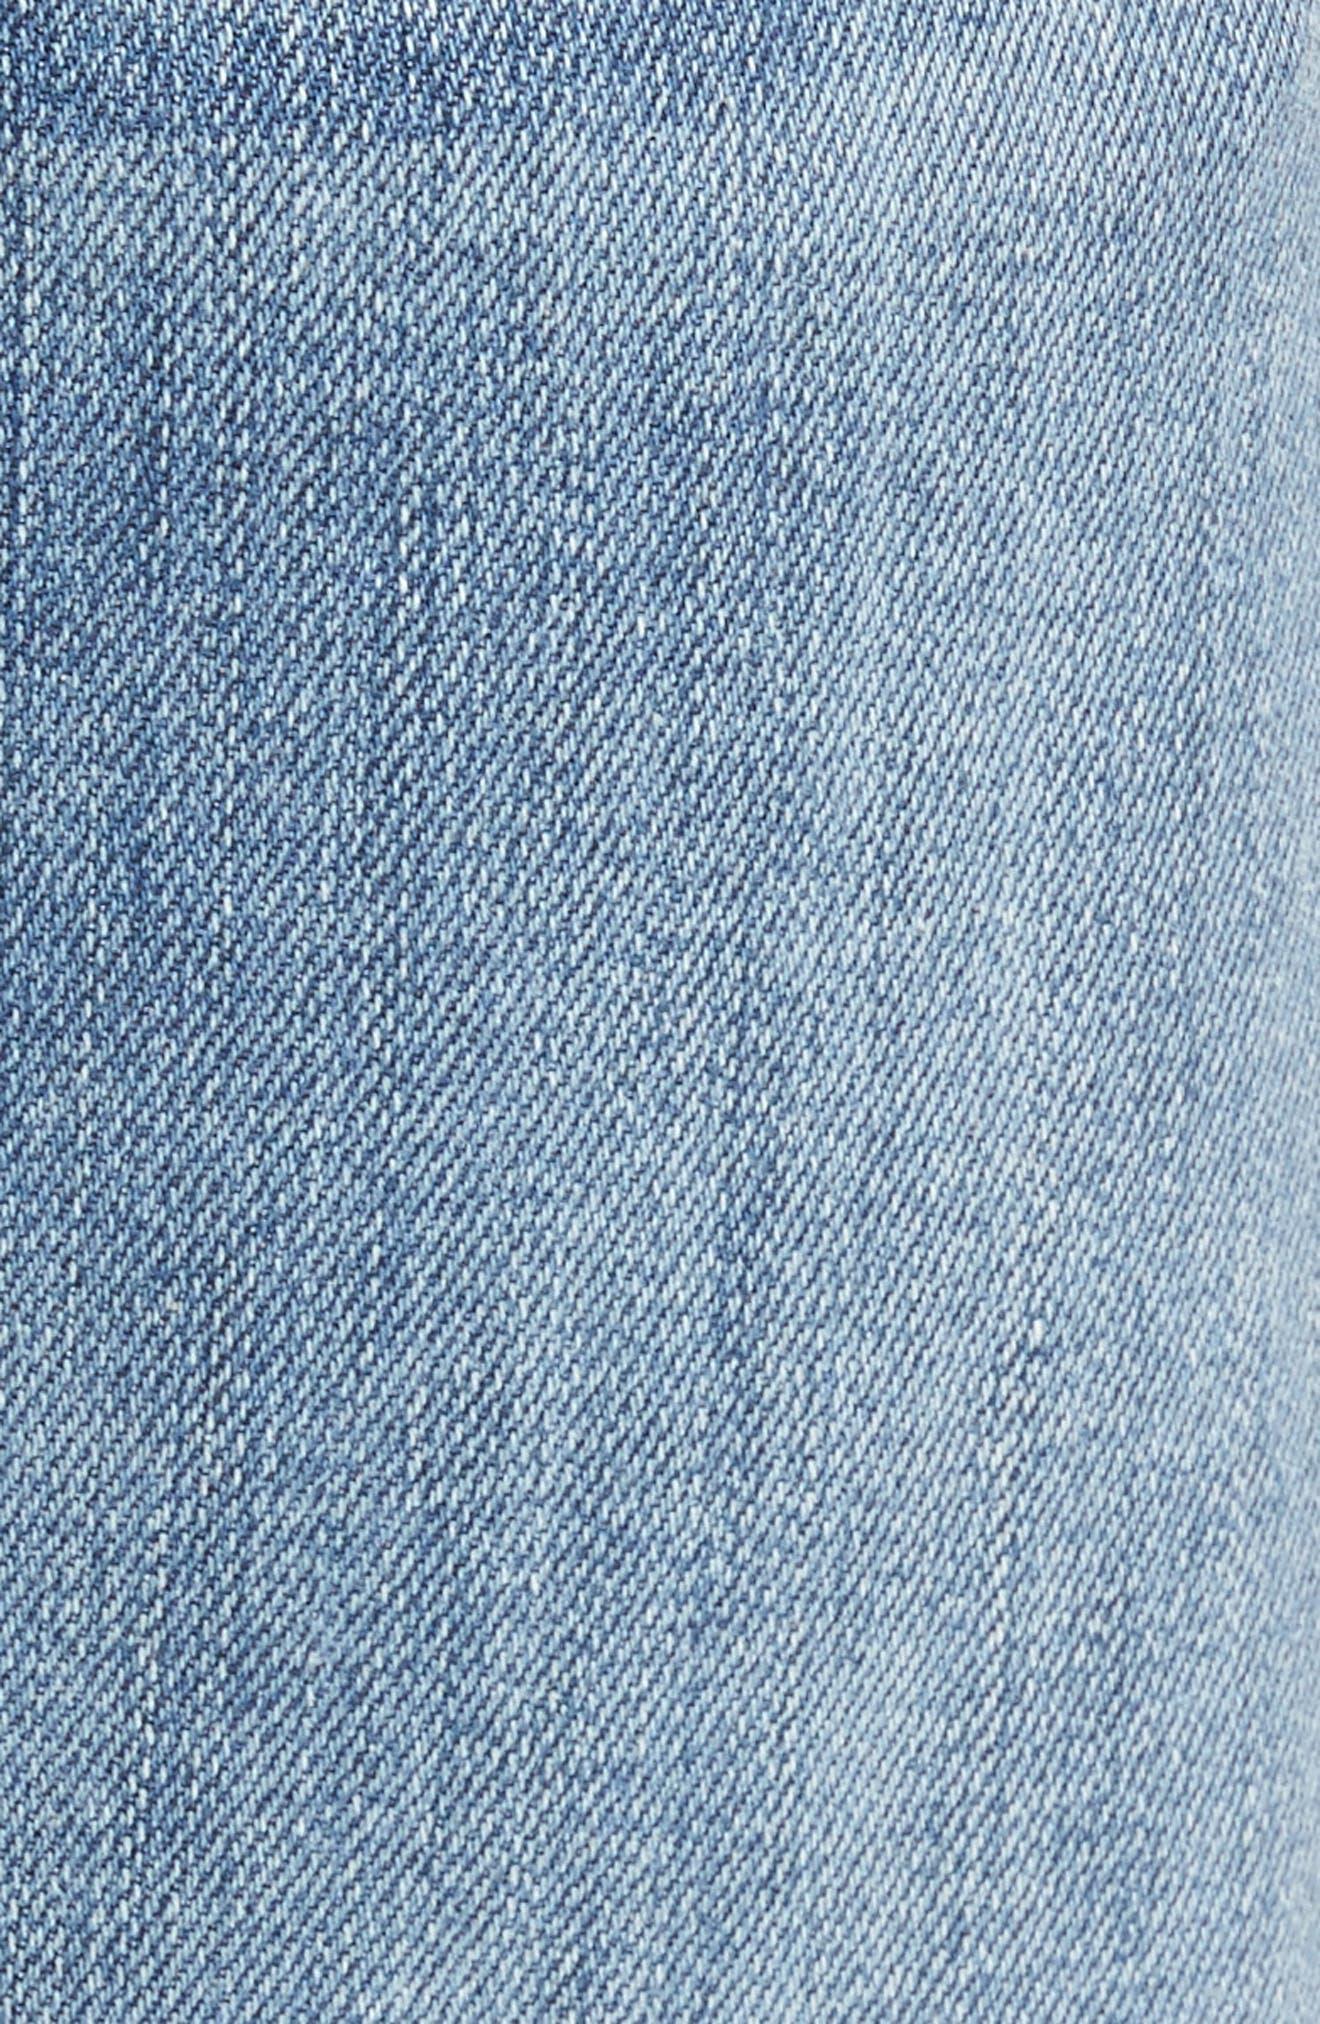 7 For All Mankind Slim Straight Leg Jeans,                             Alternate thumbnail 5, color,                             400